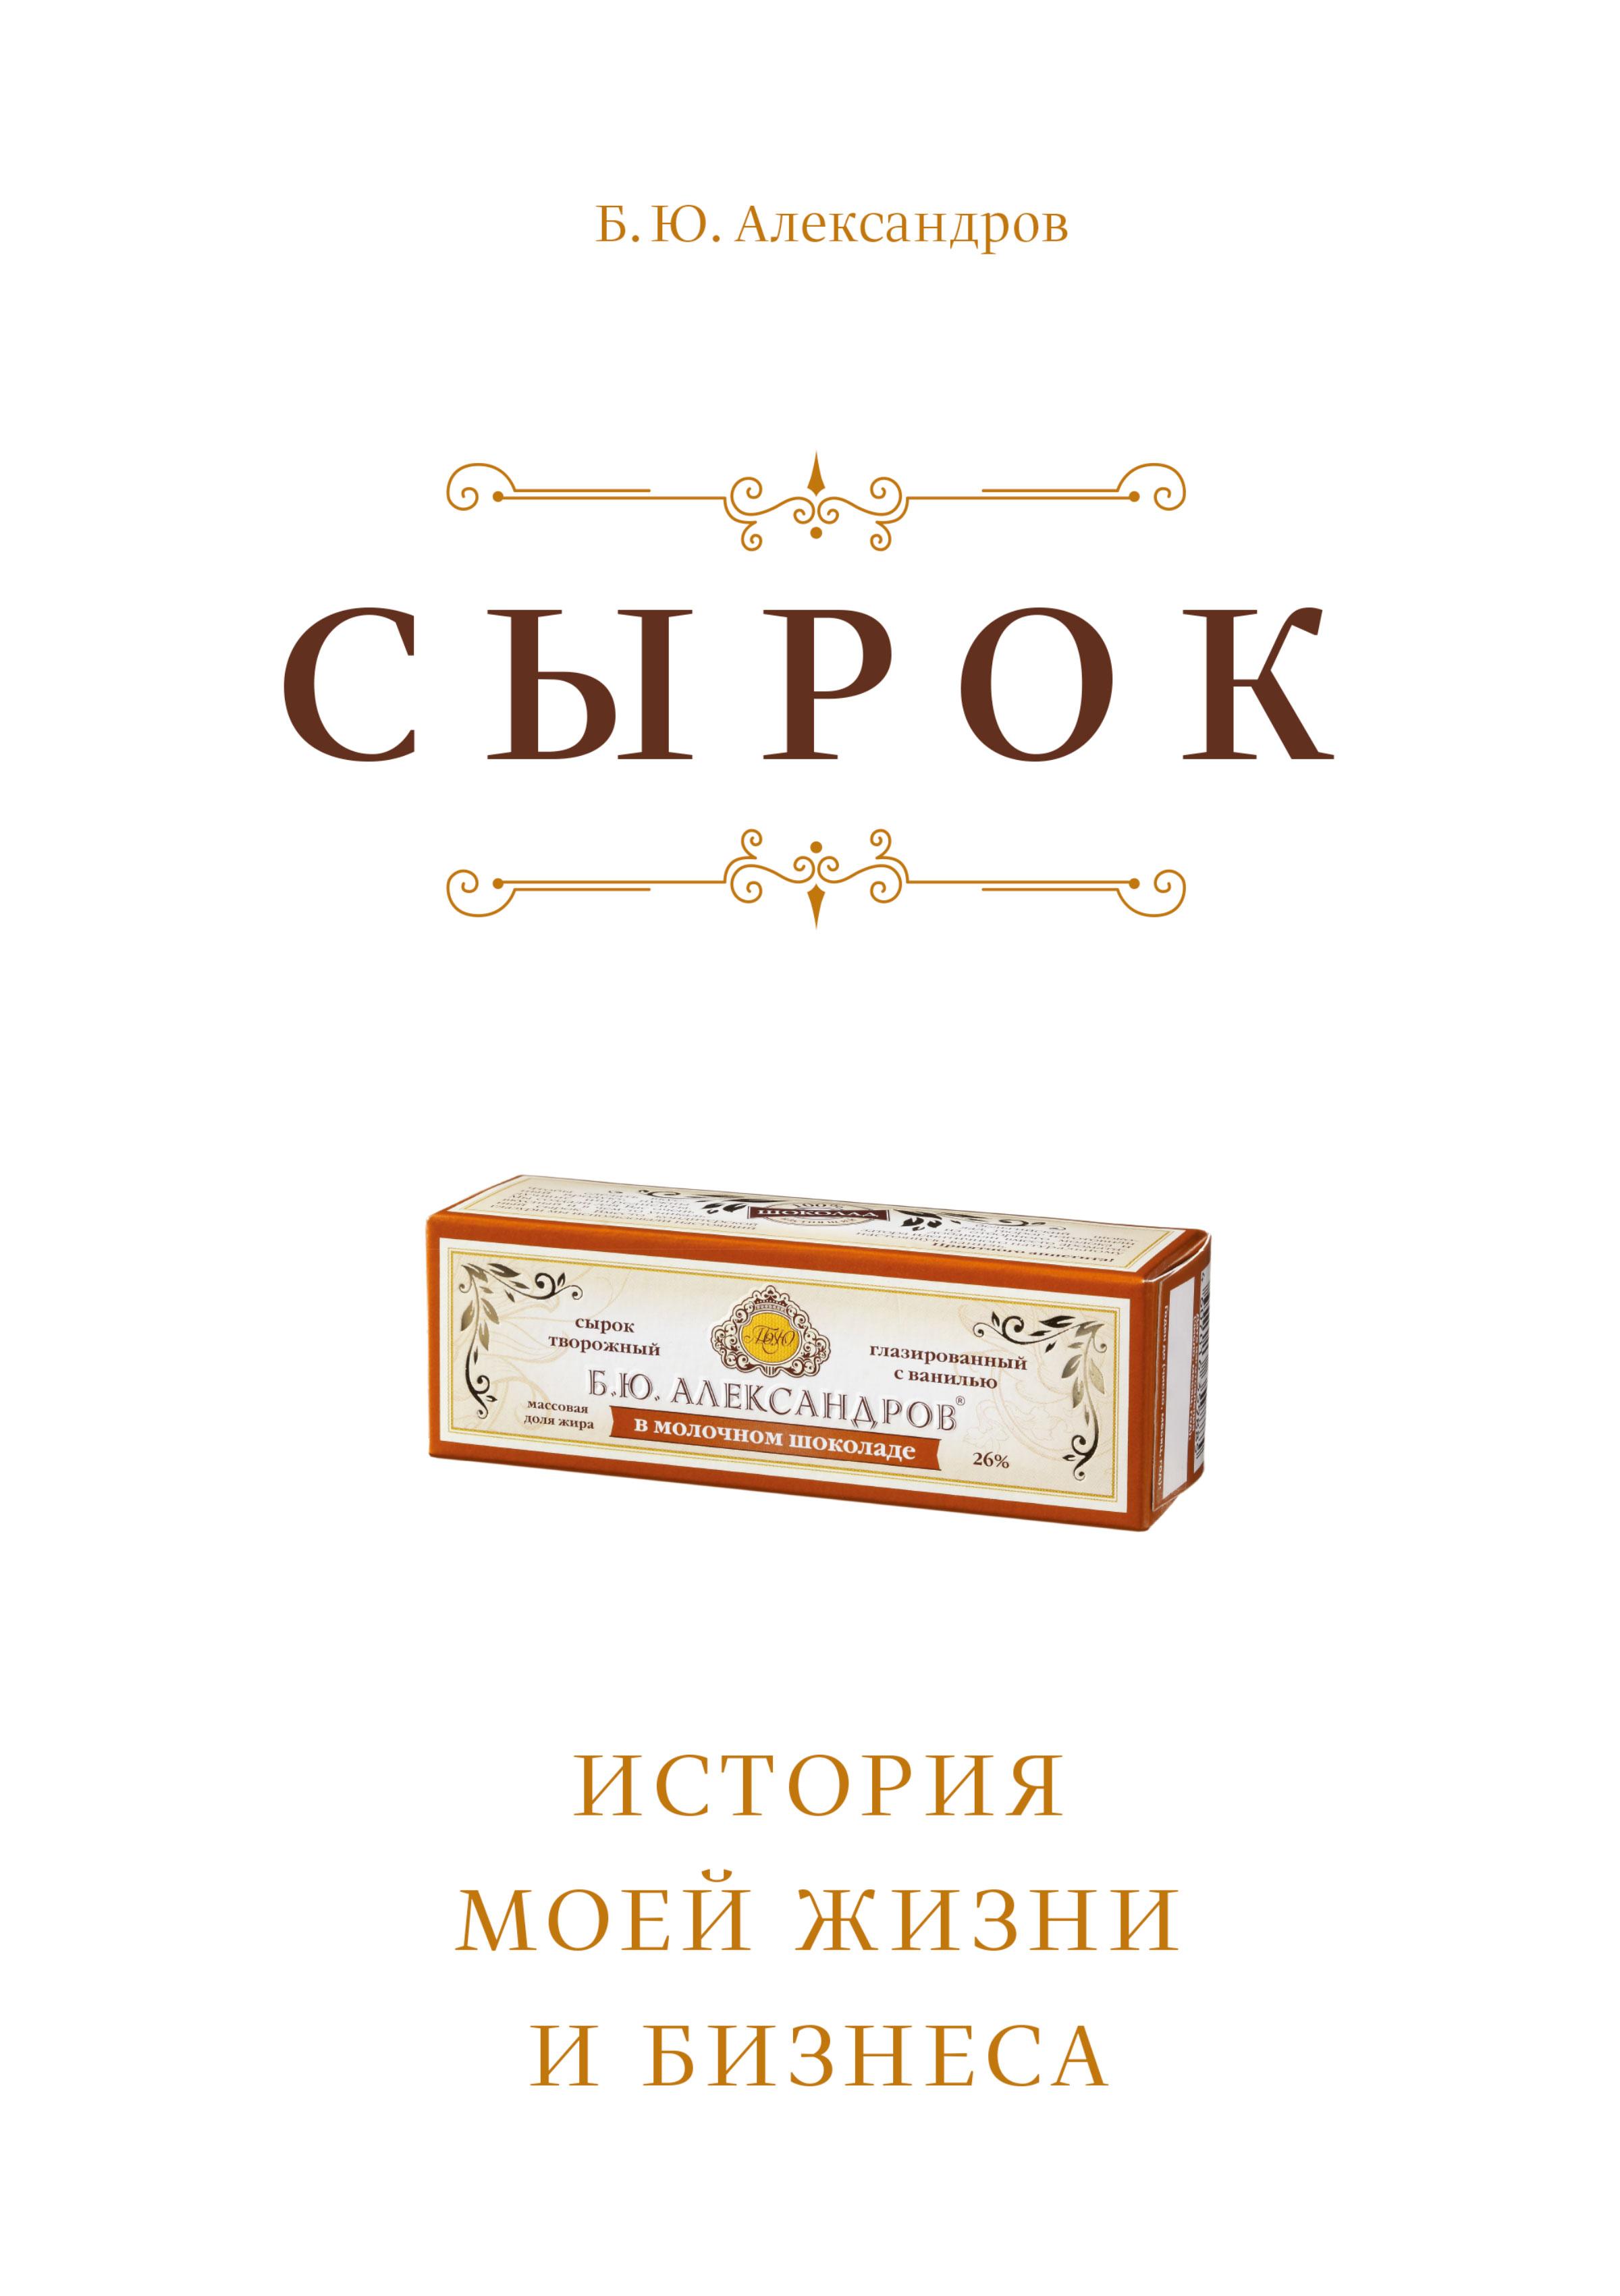 Борис Александров Сырок творог б ю александров клубника 4 2